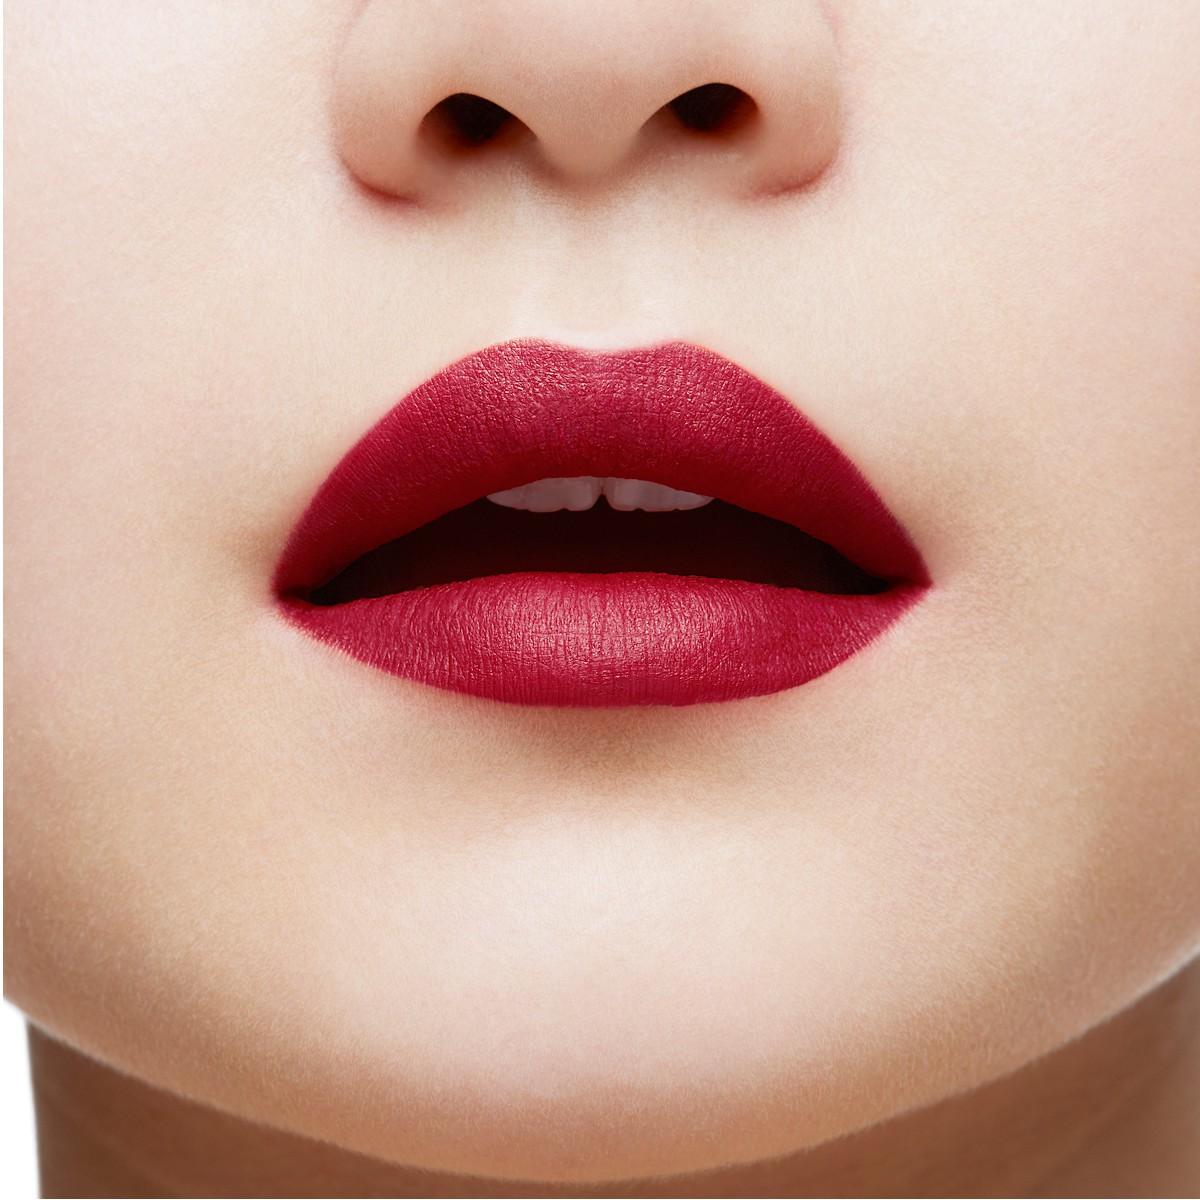 Beauty - Multimiss - Christian Louboutin